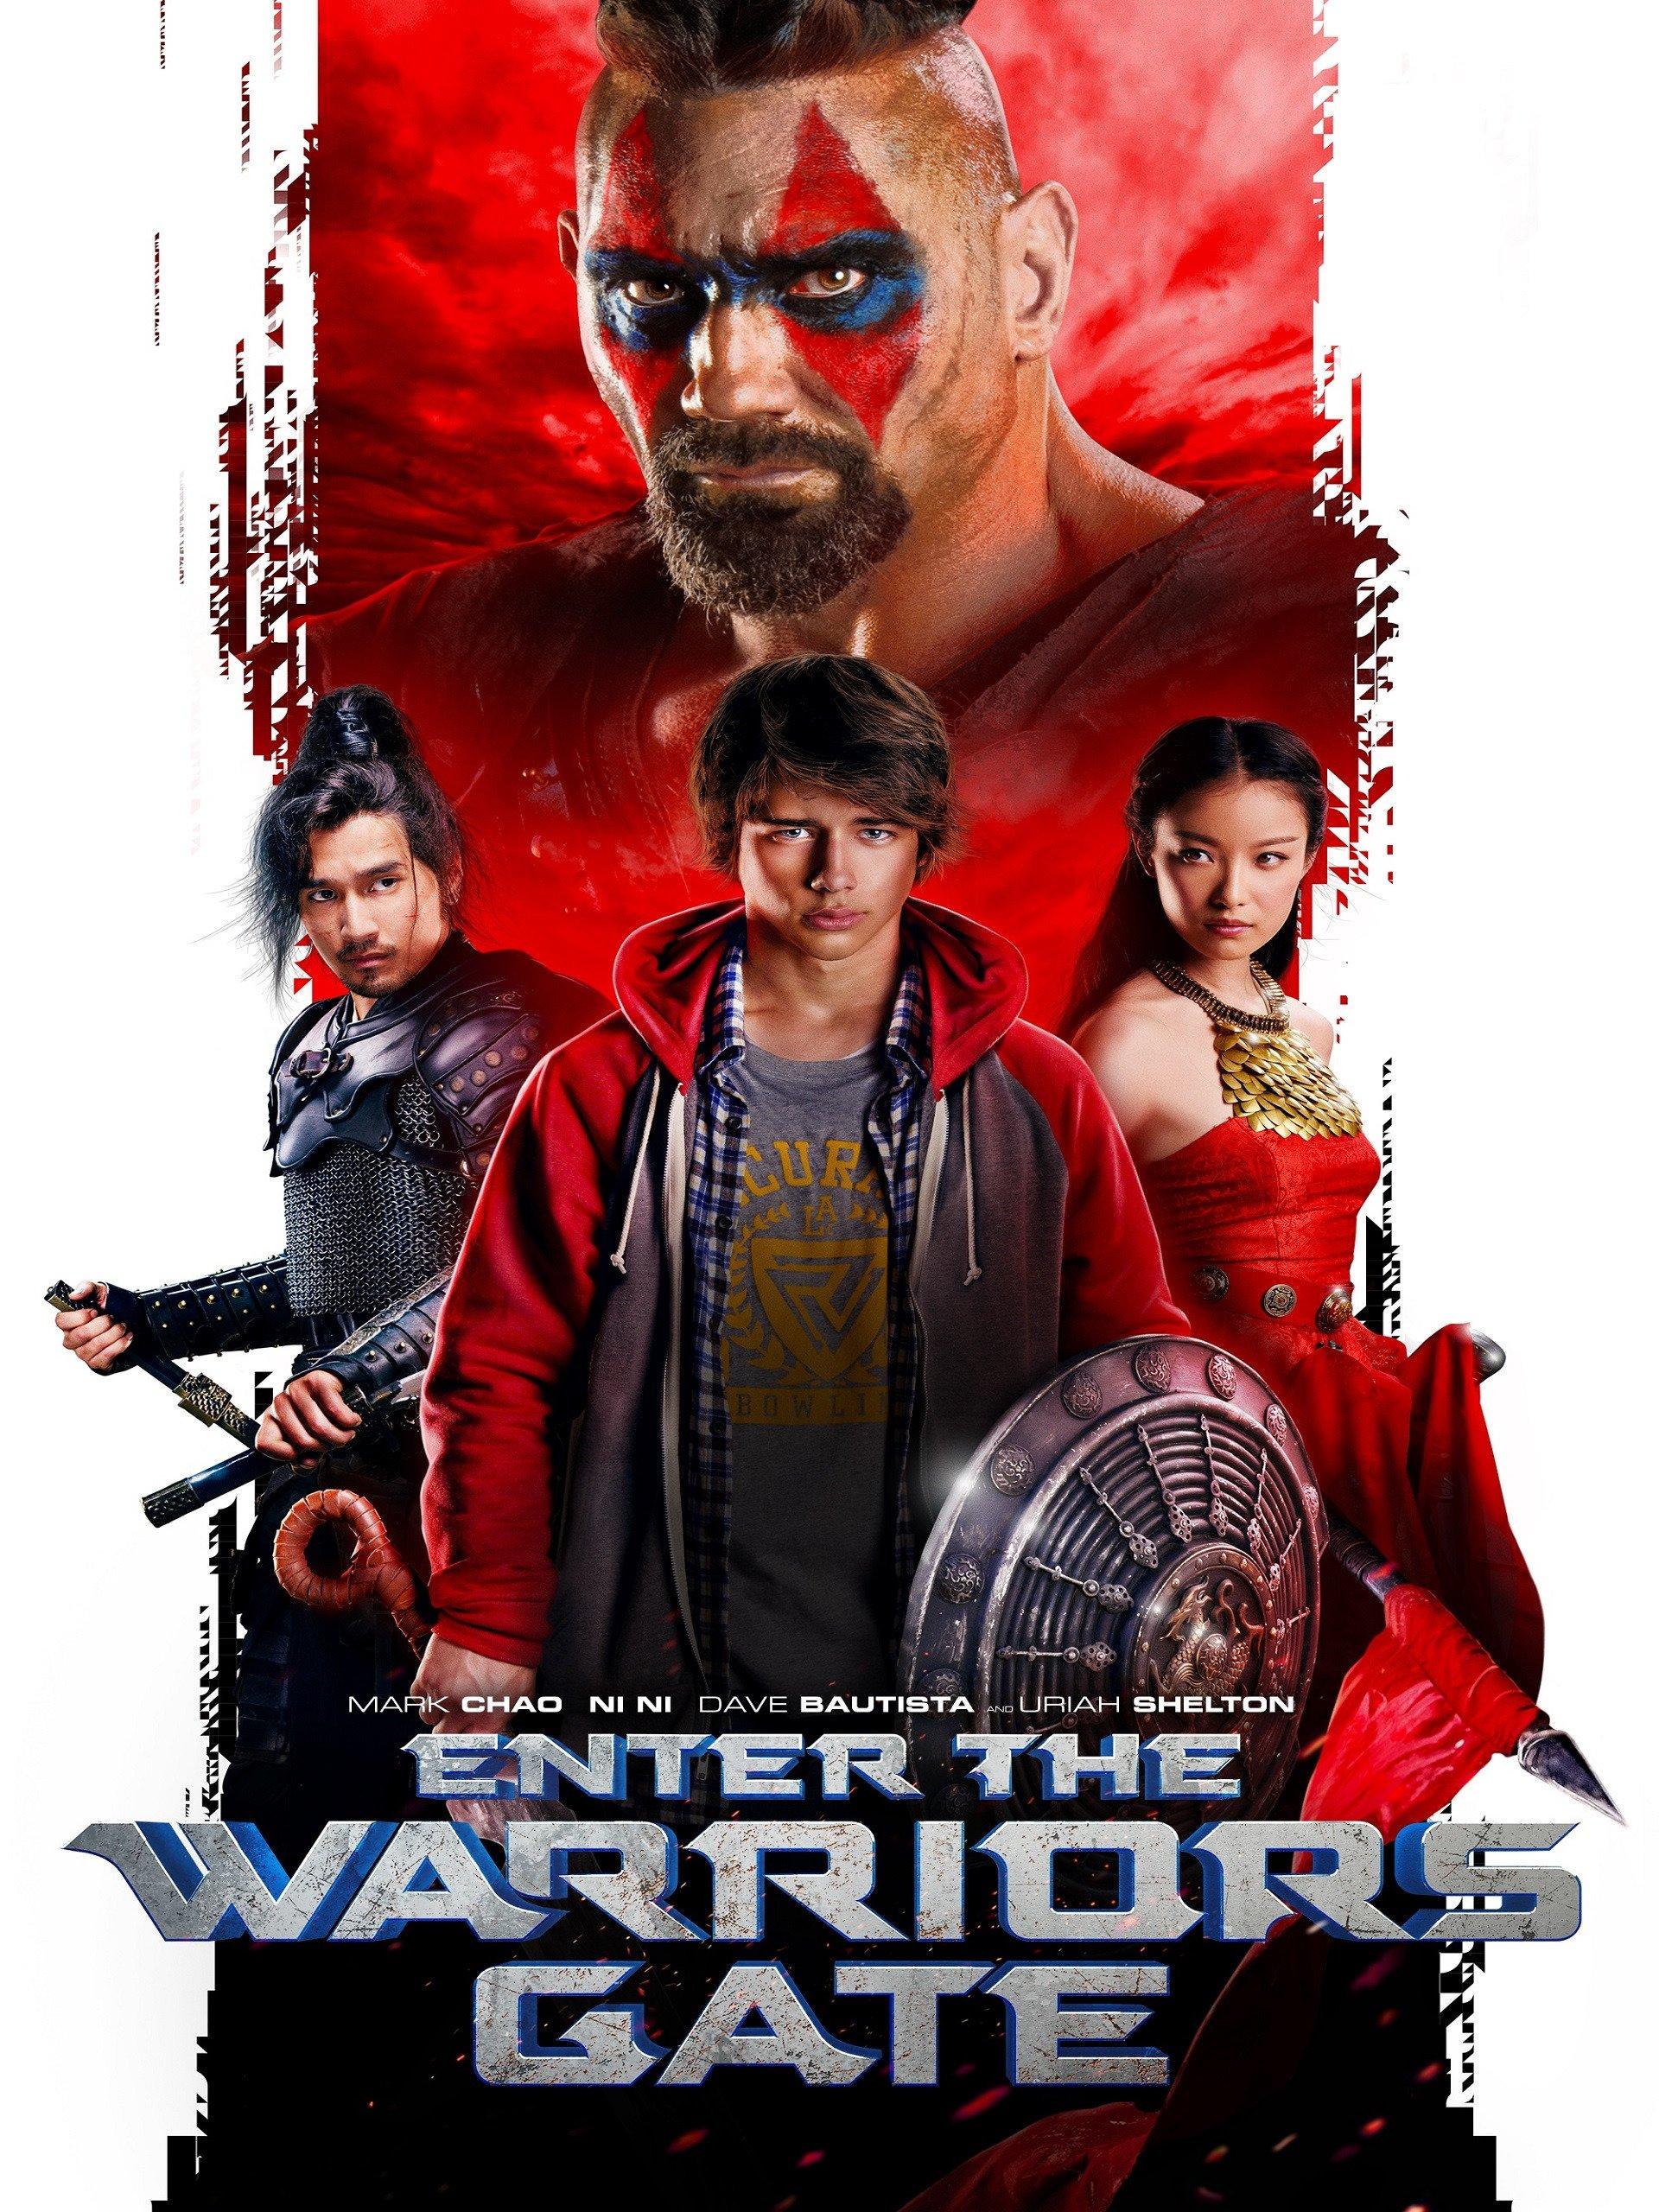 watch enter the warriors gate free online